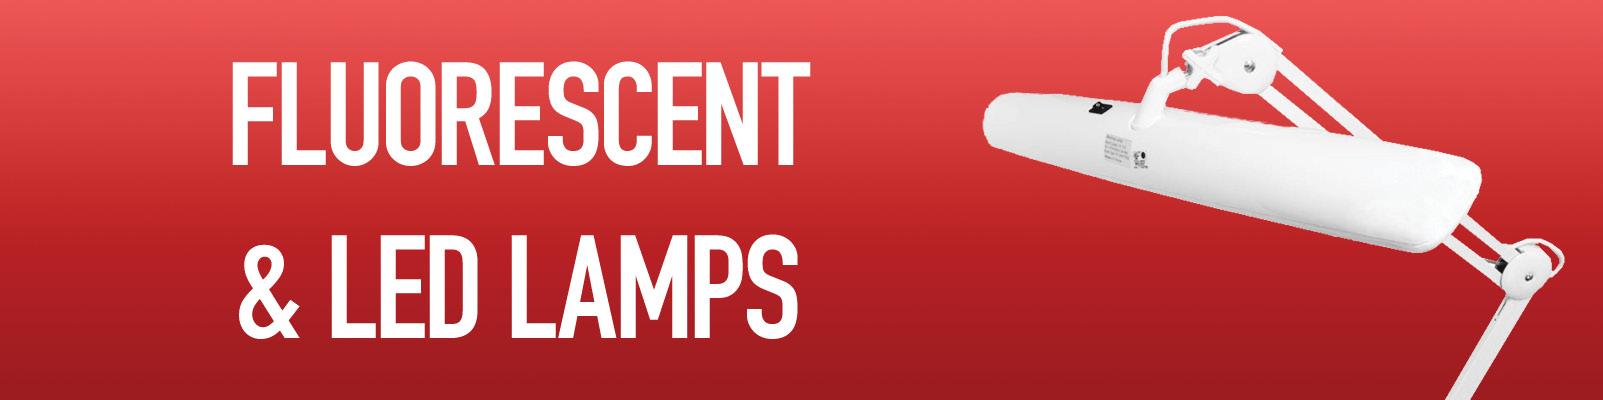 Fluorescent / LED Lamps